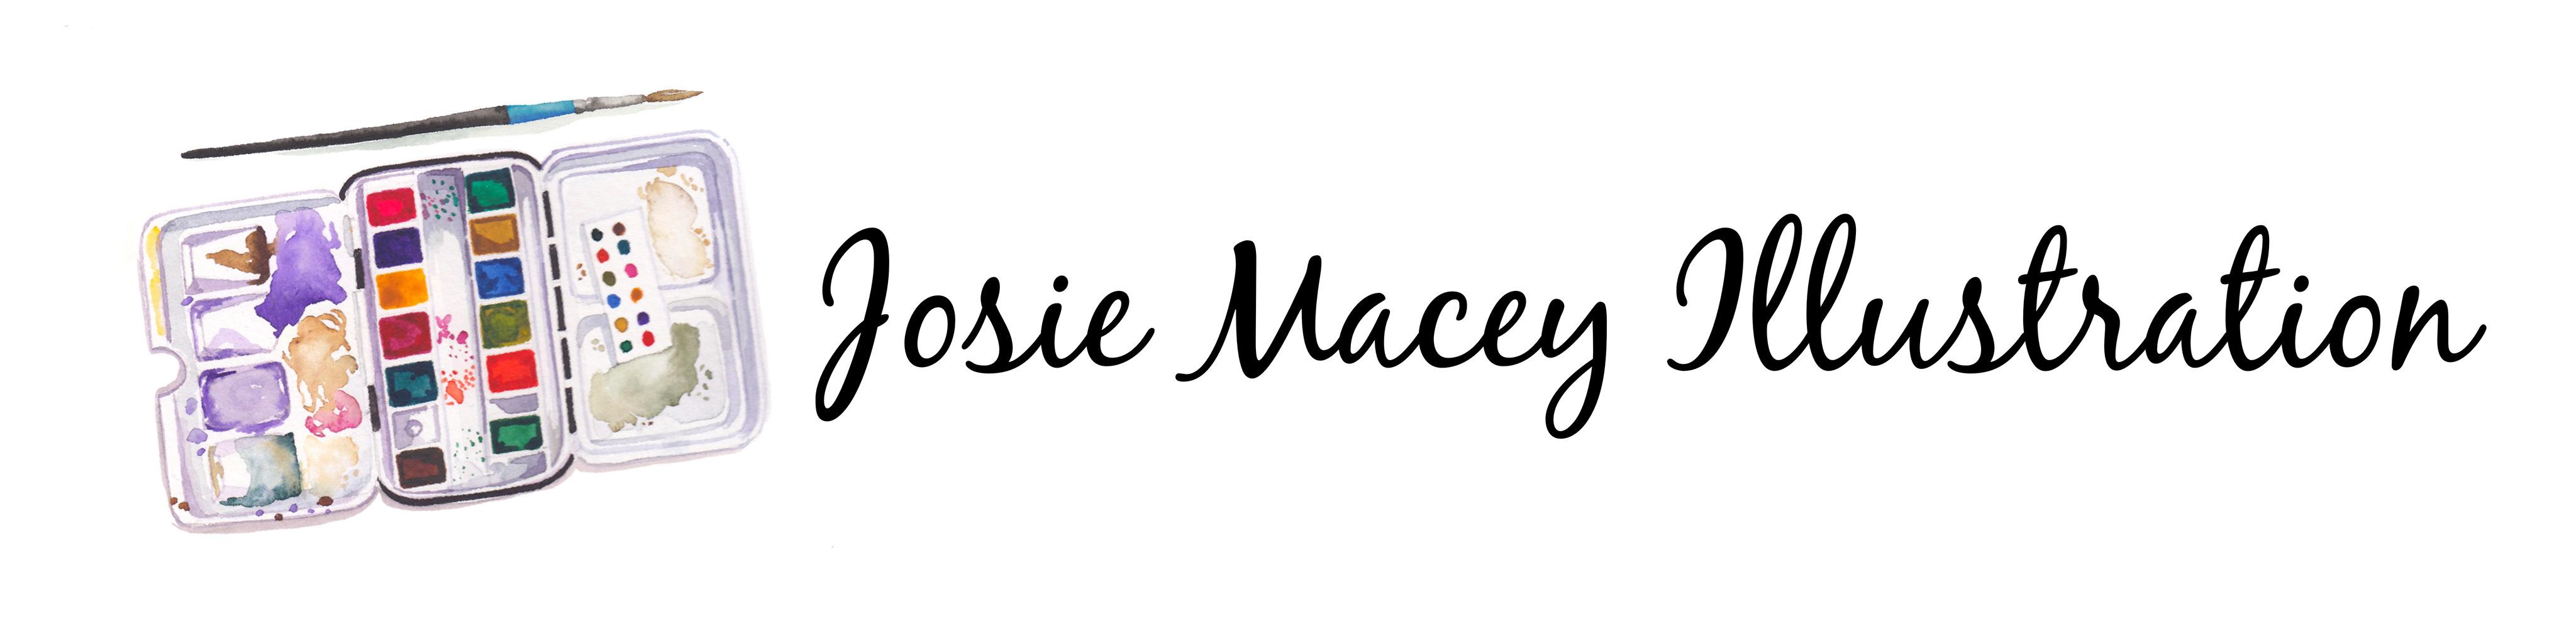 JOSIE MACEY ILLUSTRATION